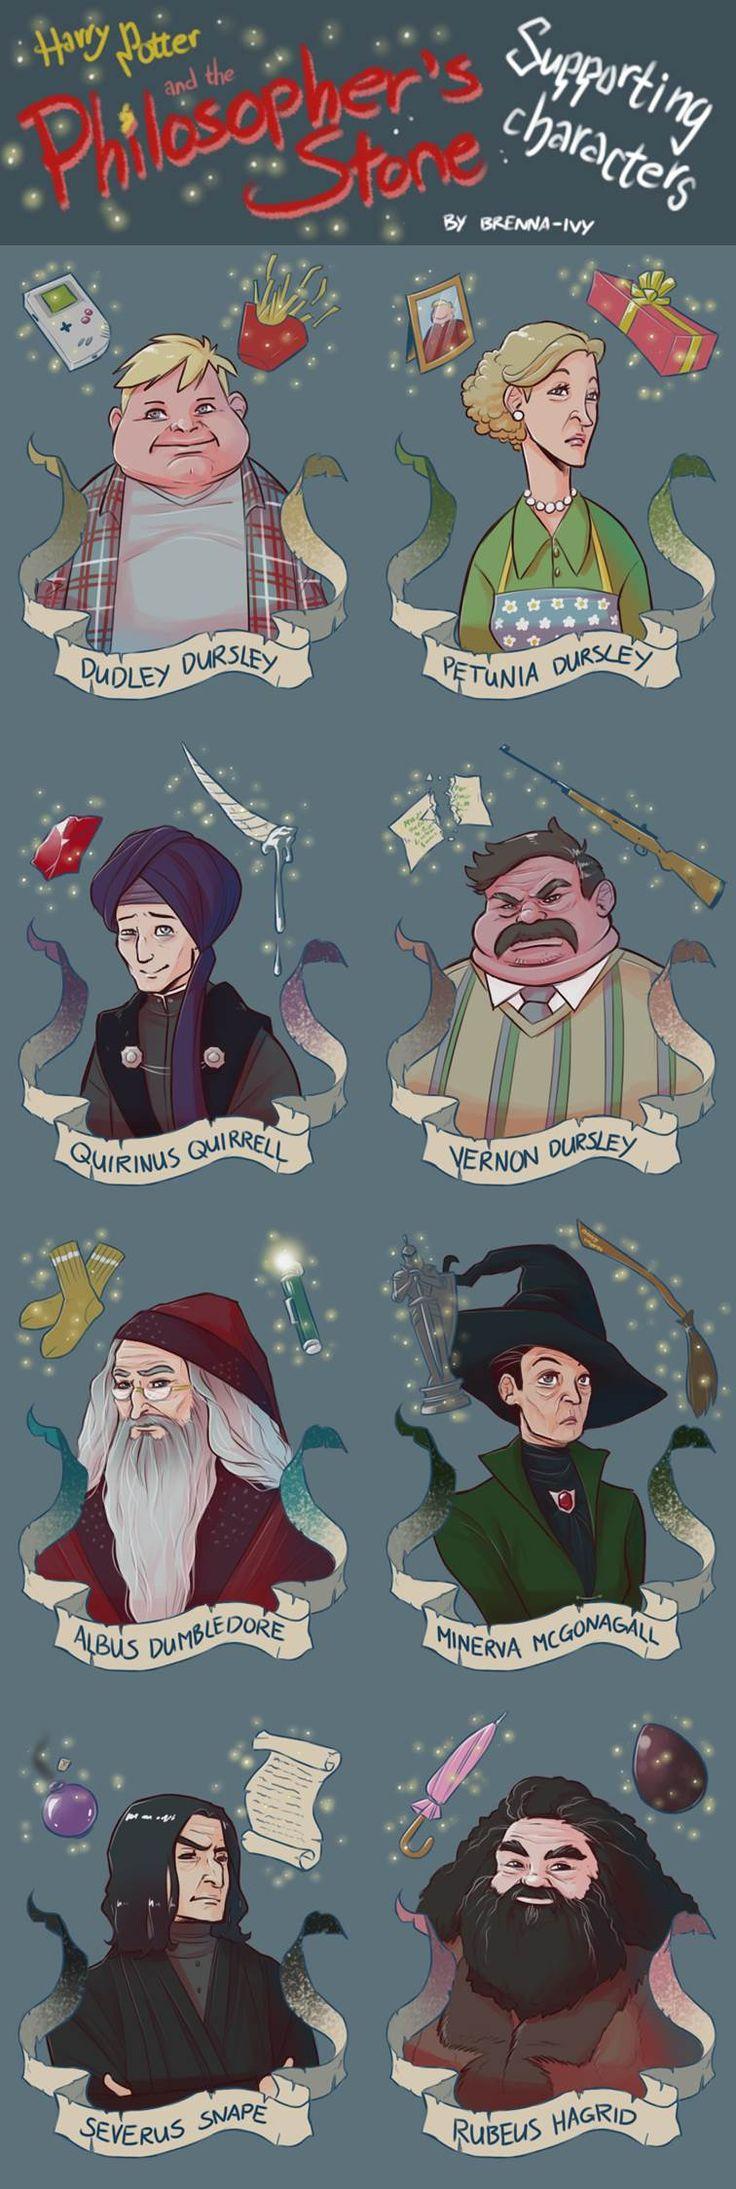 Harry Potter - Dudley, Petunia, Quirrell, Vernon, Dumbledore, McGonagall, Snape and Hagrid